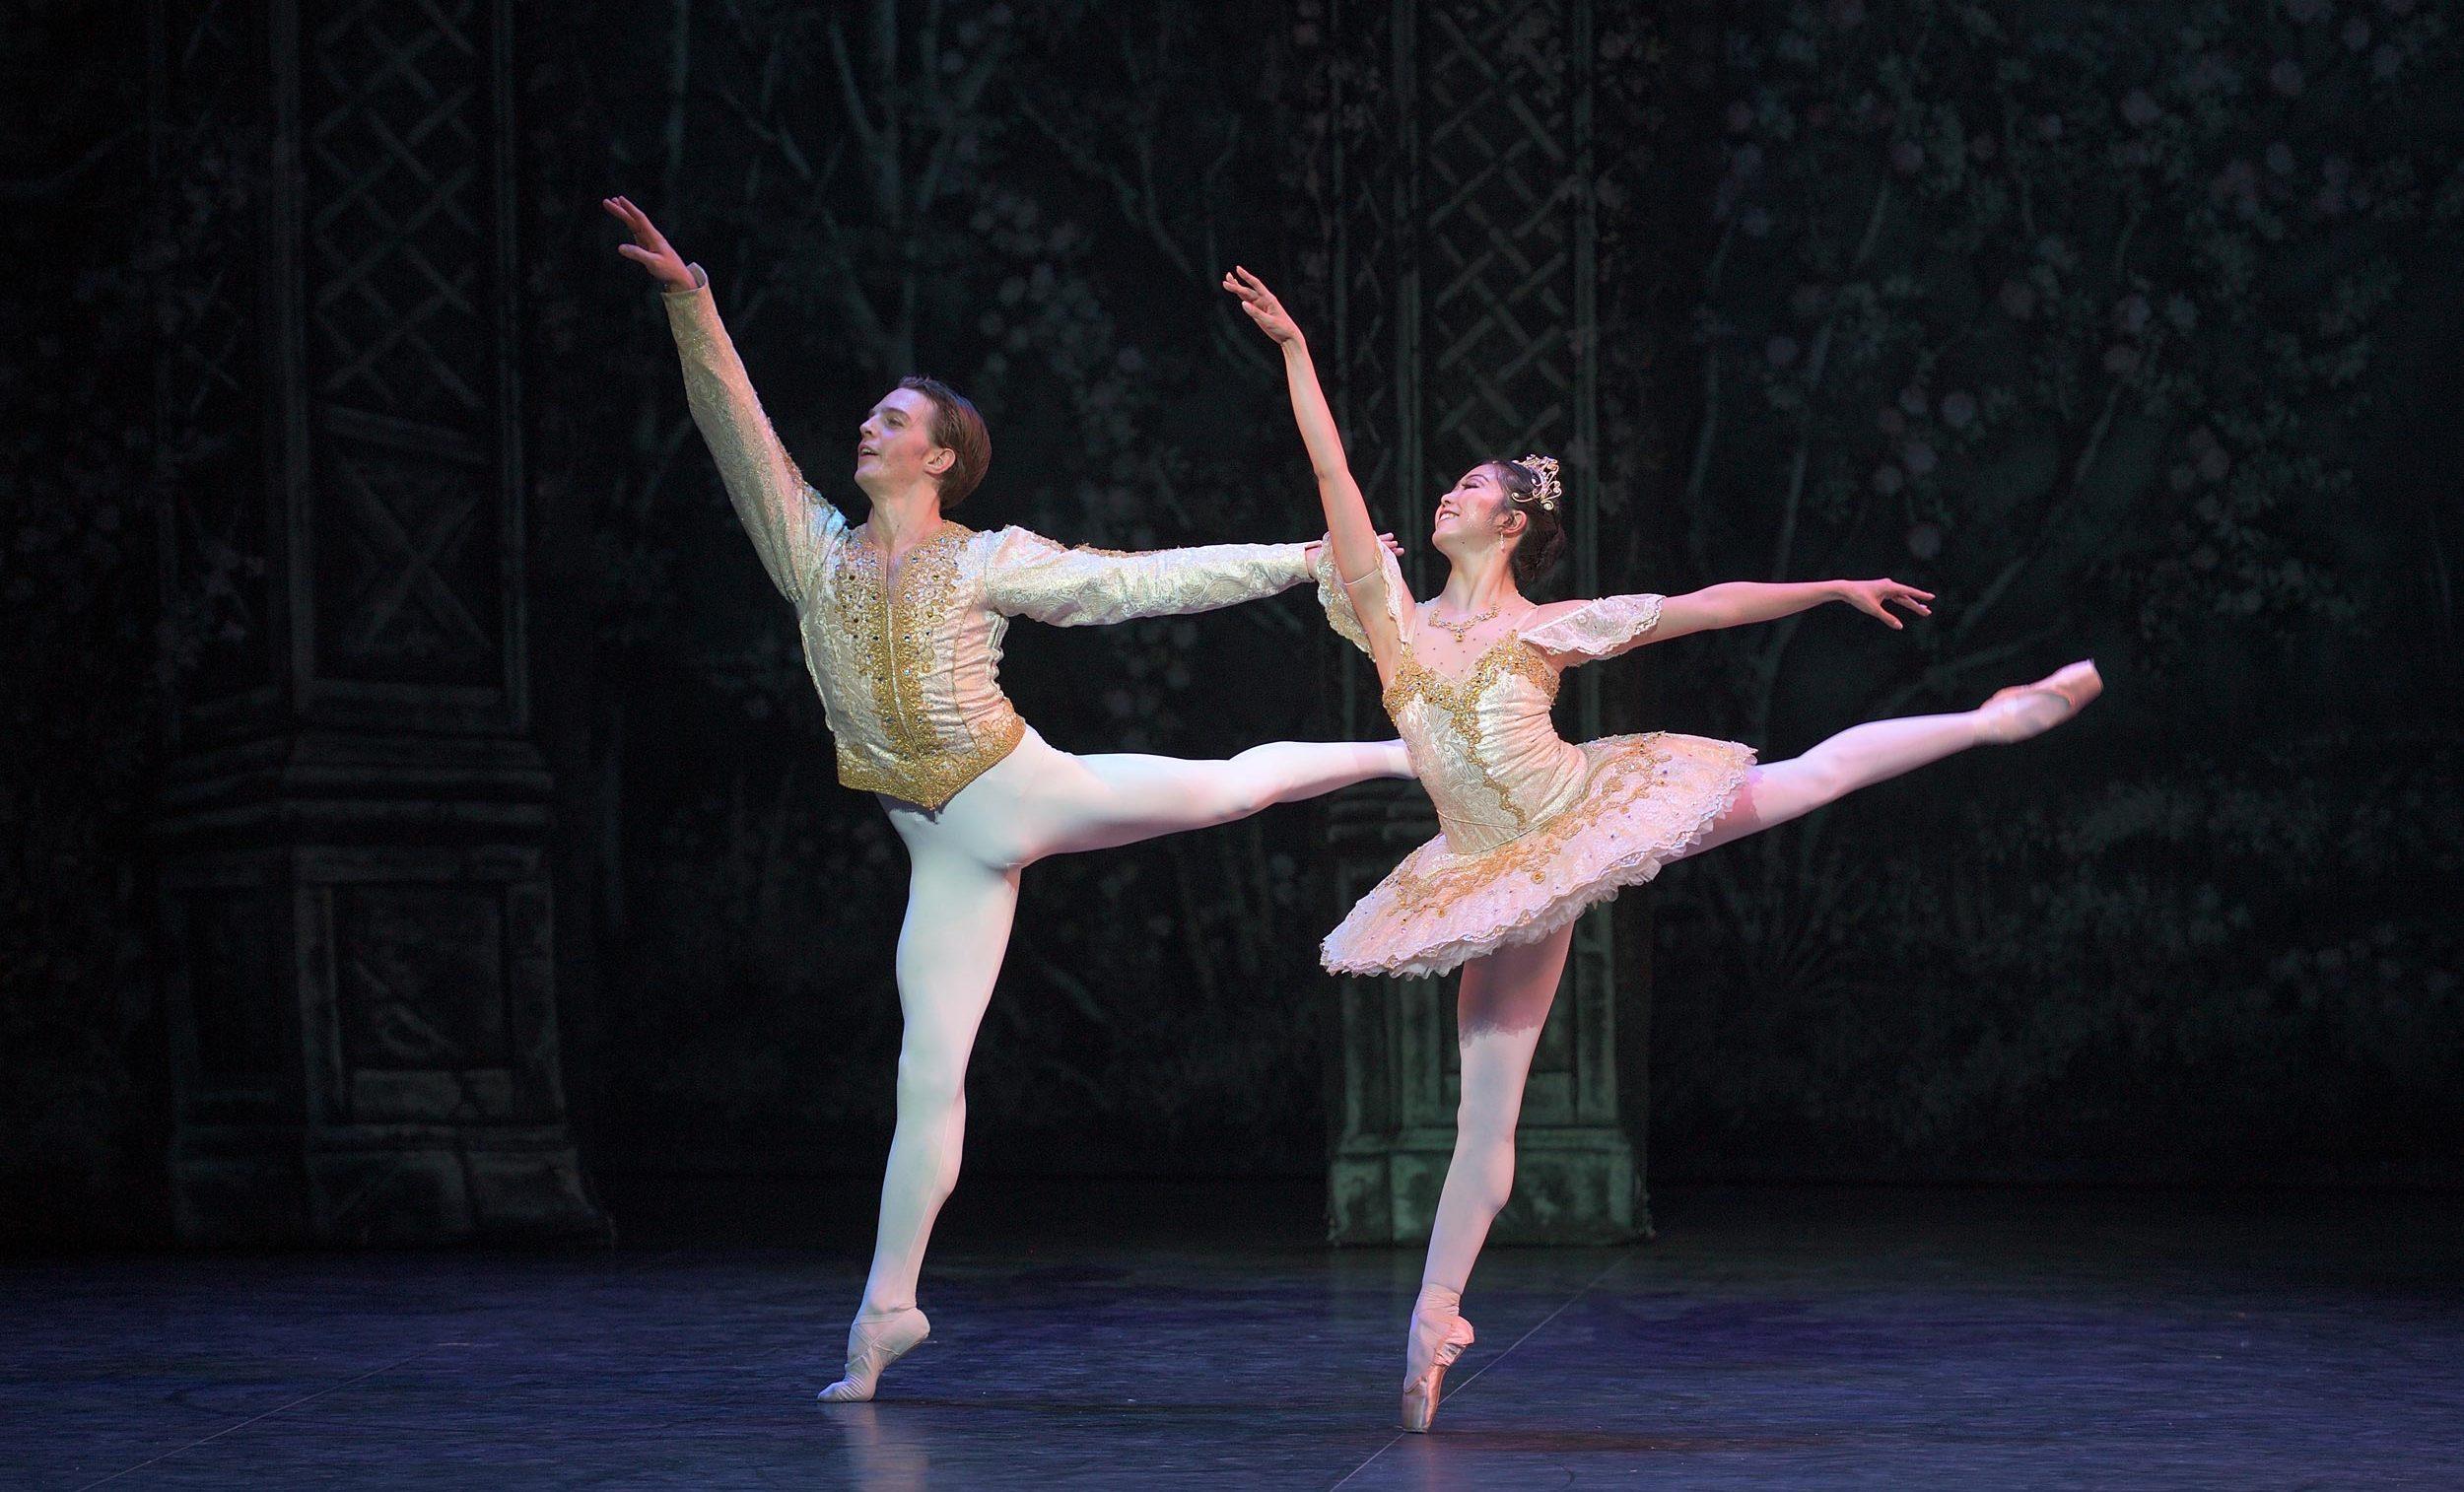 Joseph Caley and Shiori Kase in English National Ballet's Nutcracker